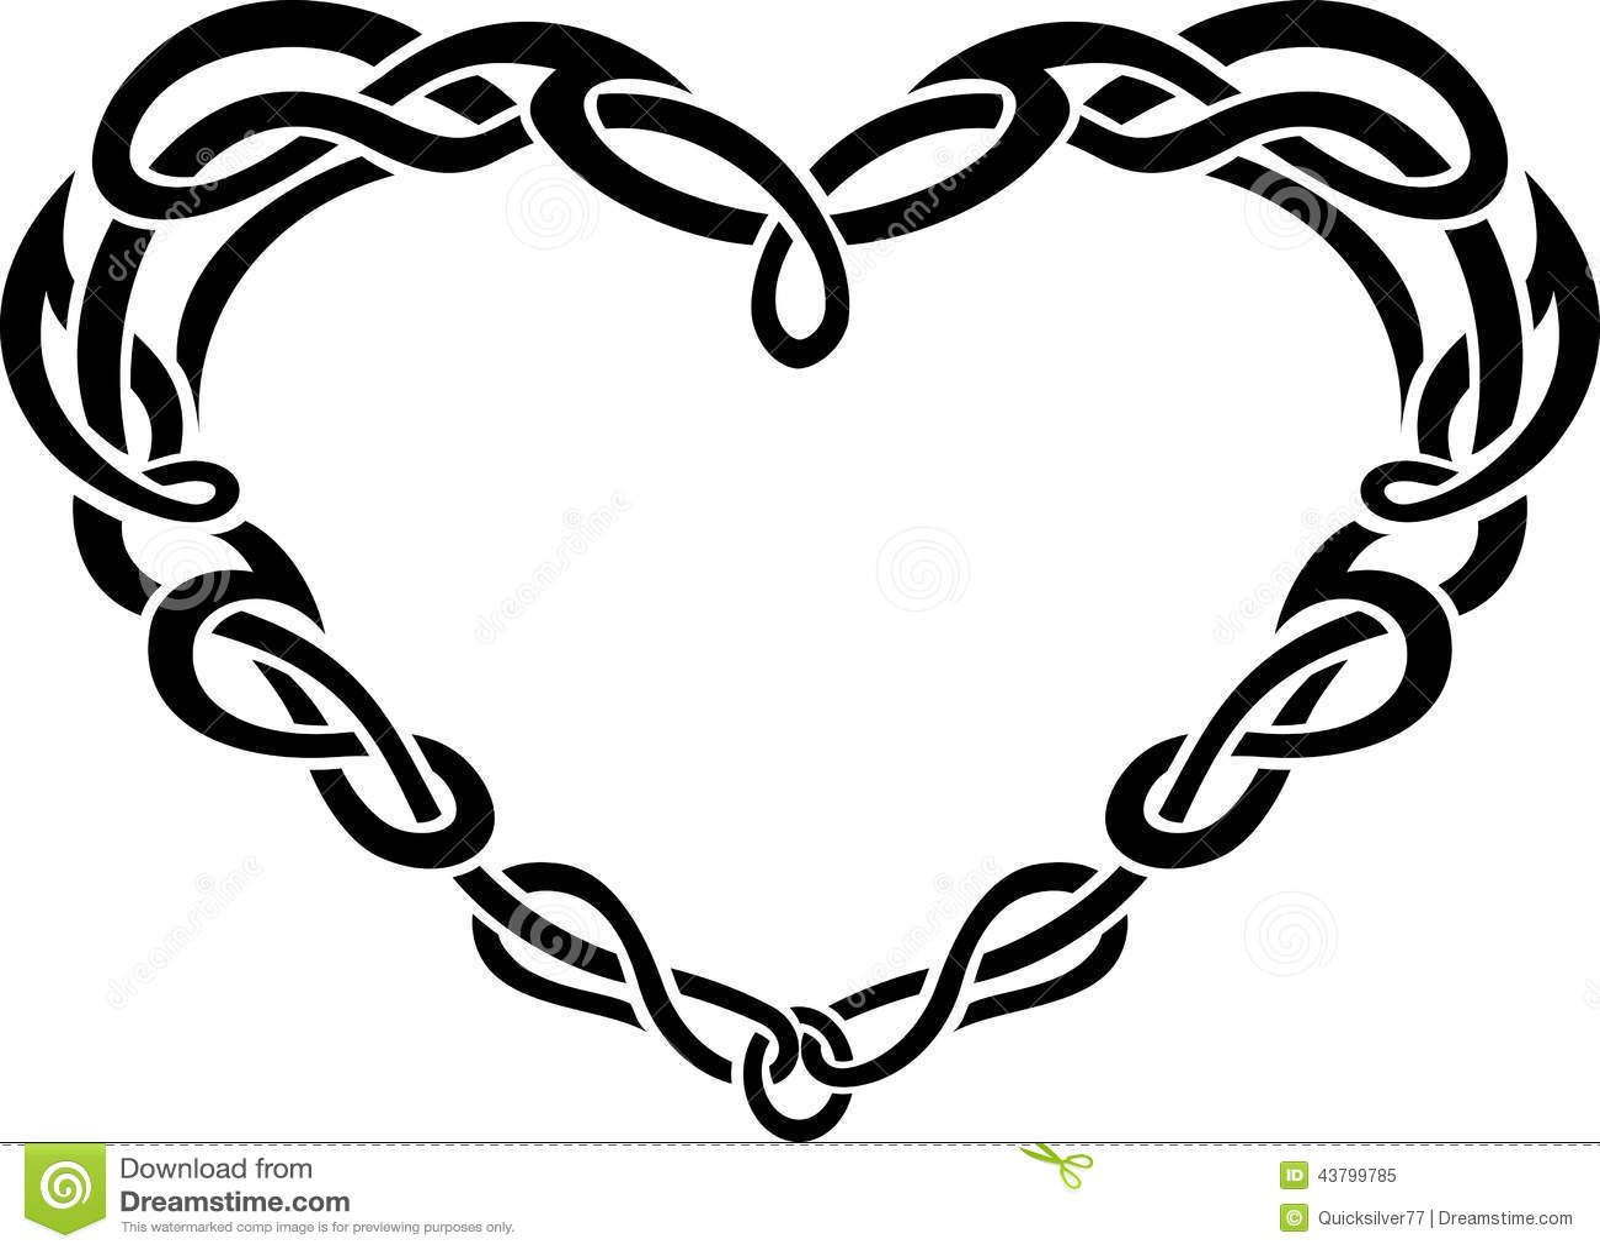 Celtic Knots Heart Stock Illustrations 67 Celtic Knots Heart Stock Illustrations Vectors Clipart Dreamstime